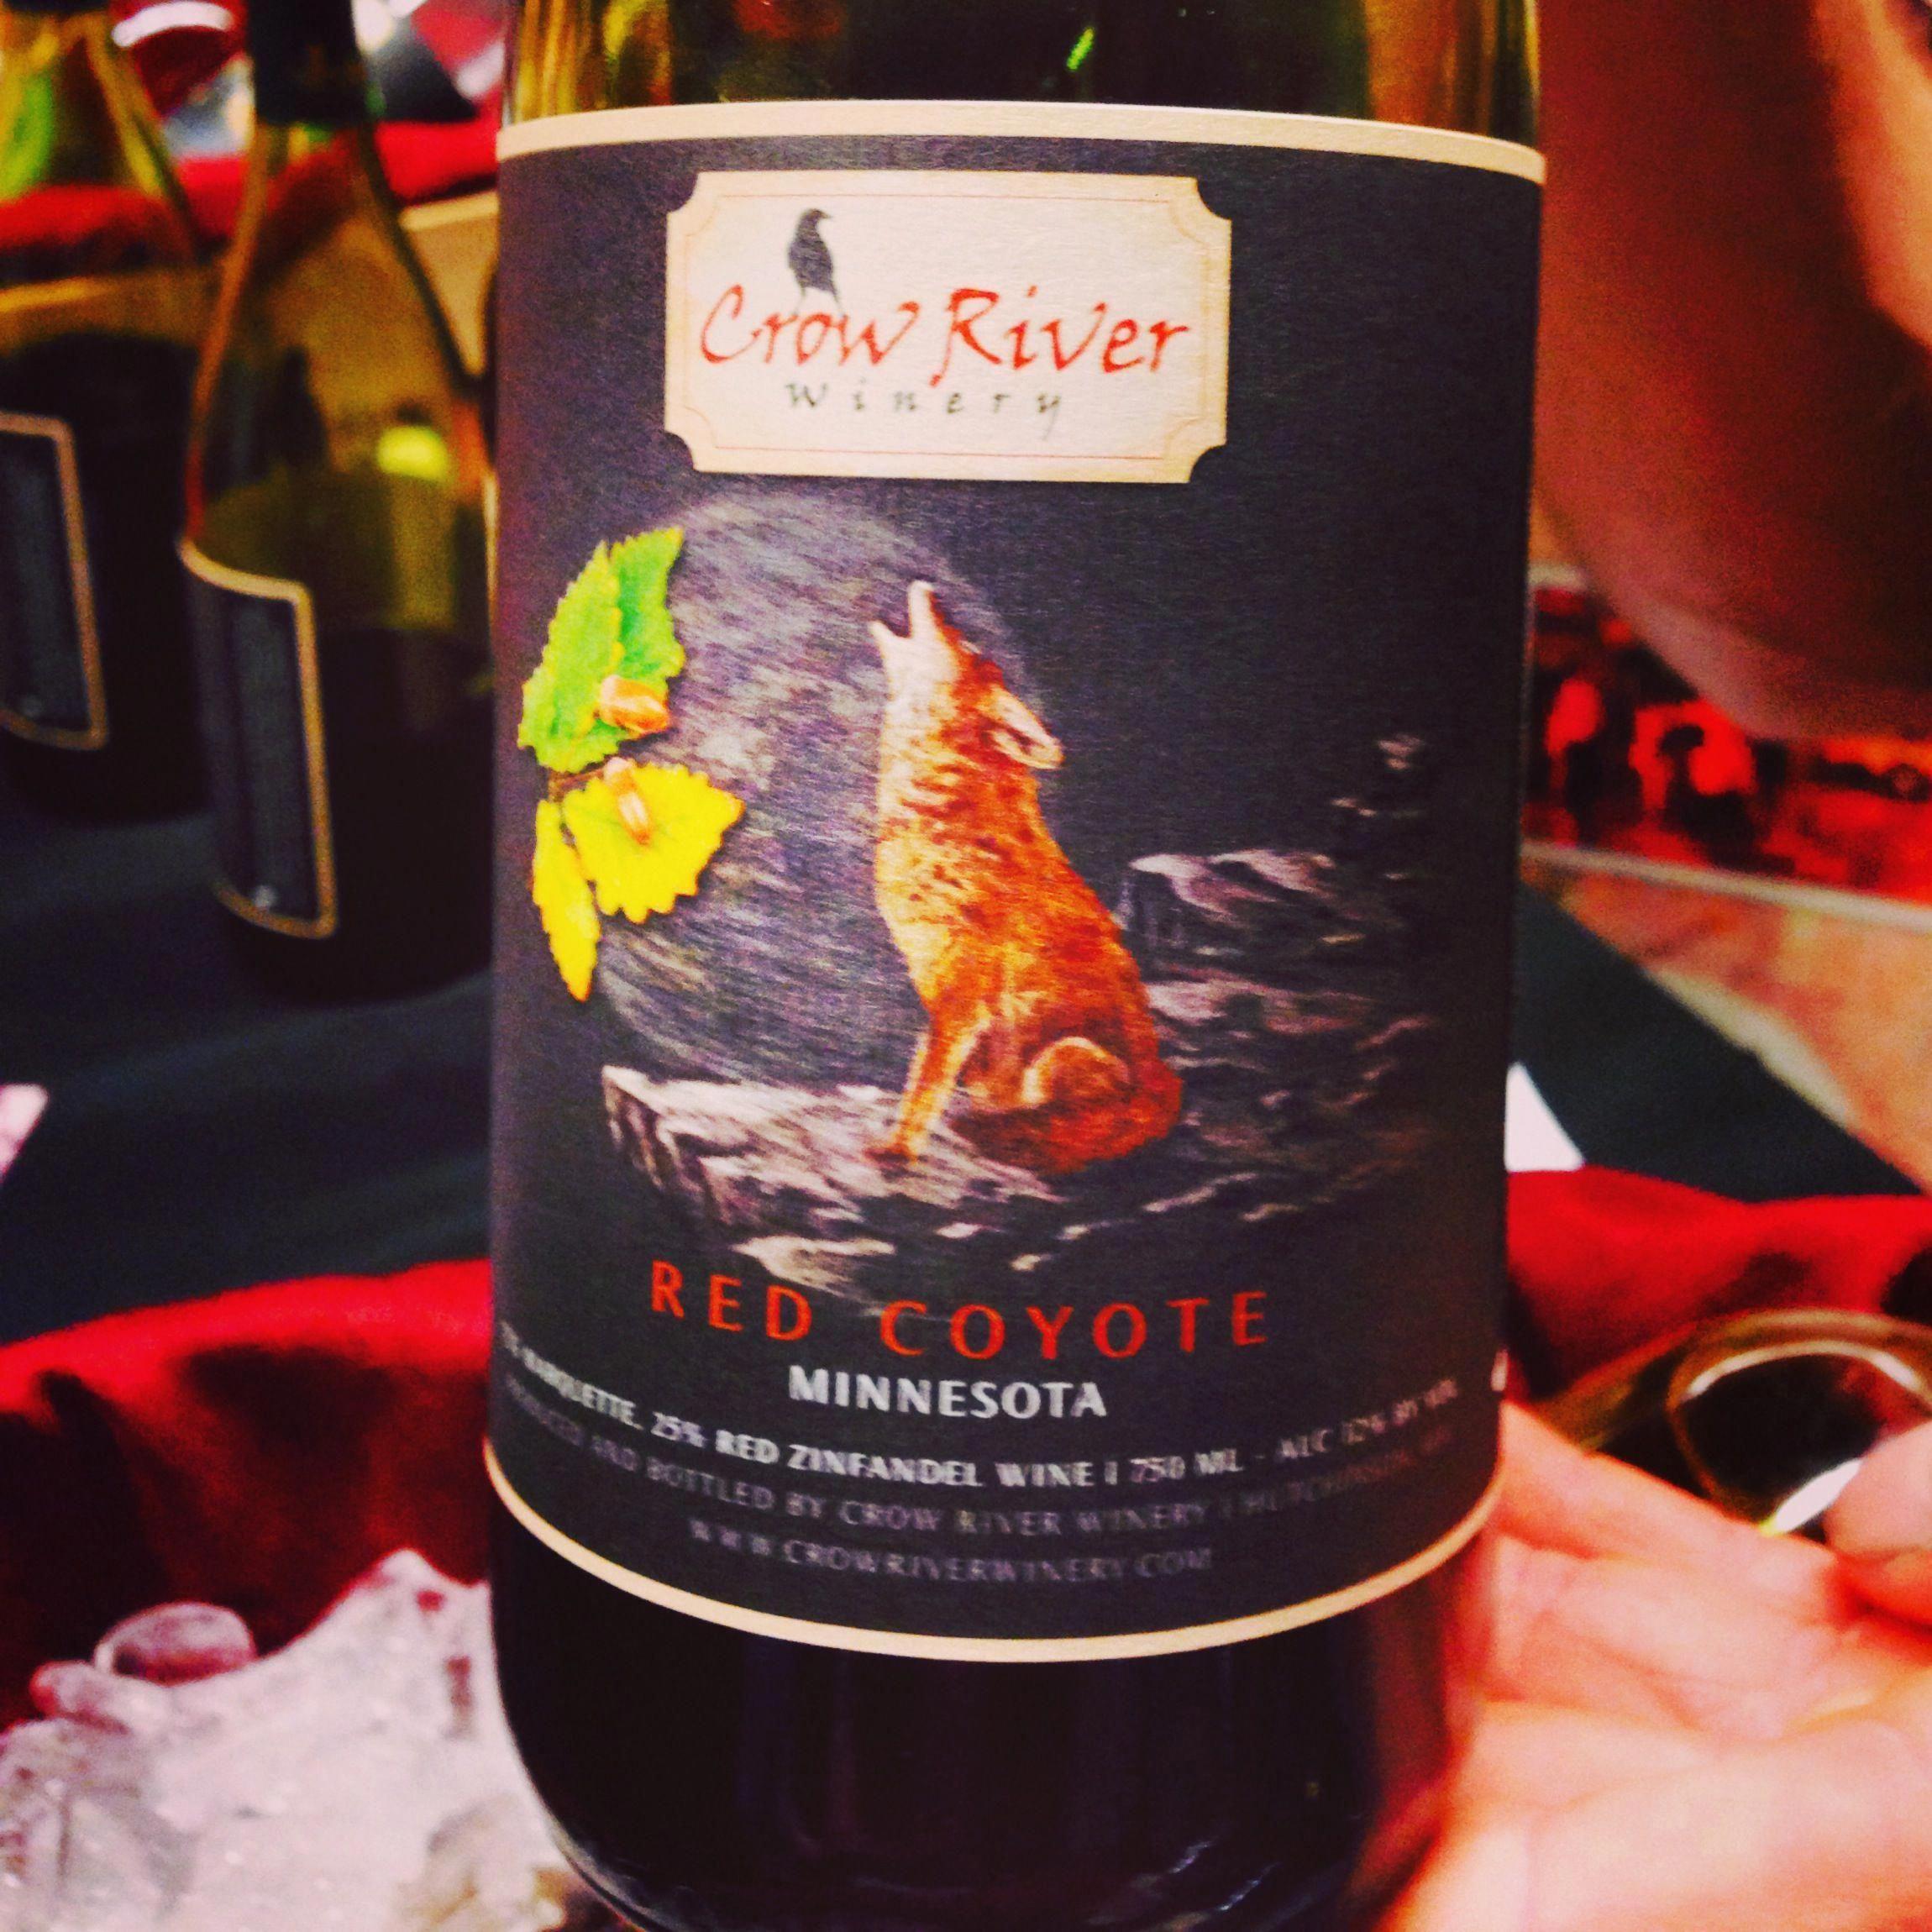 Wine Making Equipment Kit Winemakingaccessories Product Id 6300645668 Fungusundertoenailcure Wine Making Bottles Wine Making Supplies Wine Making Yeast